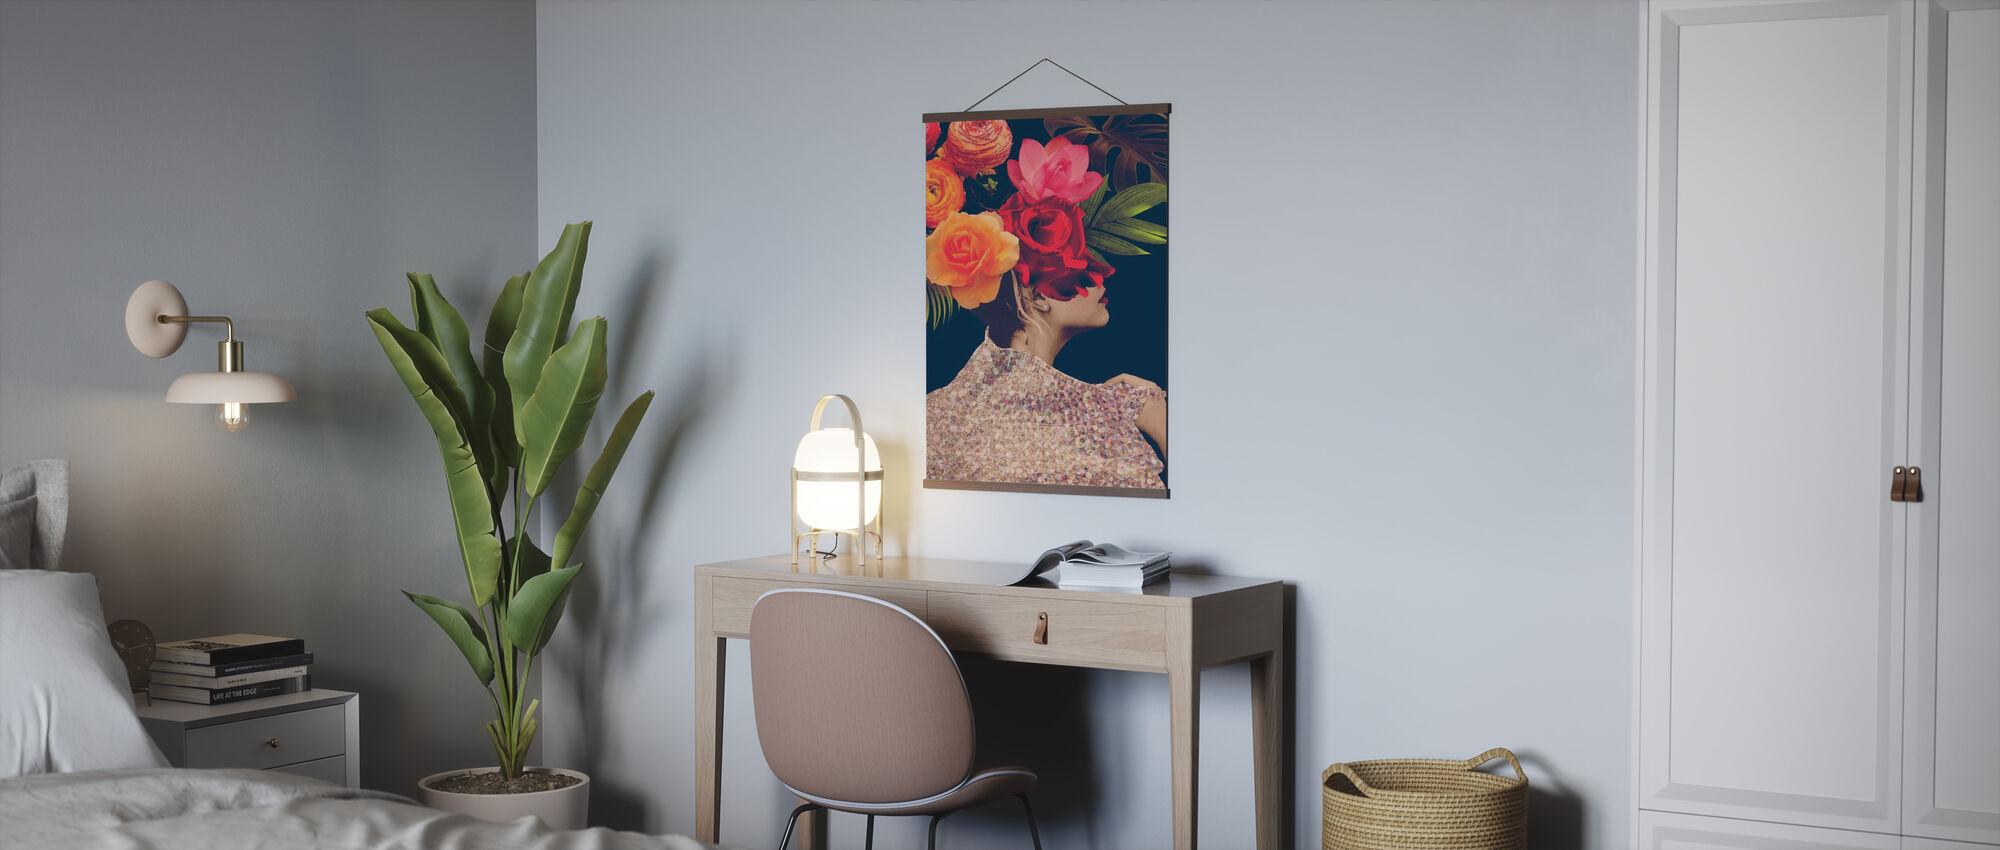 Collage Fleur - Poster - Uffici